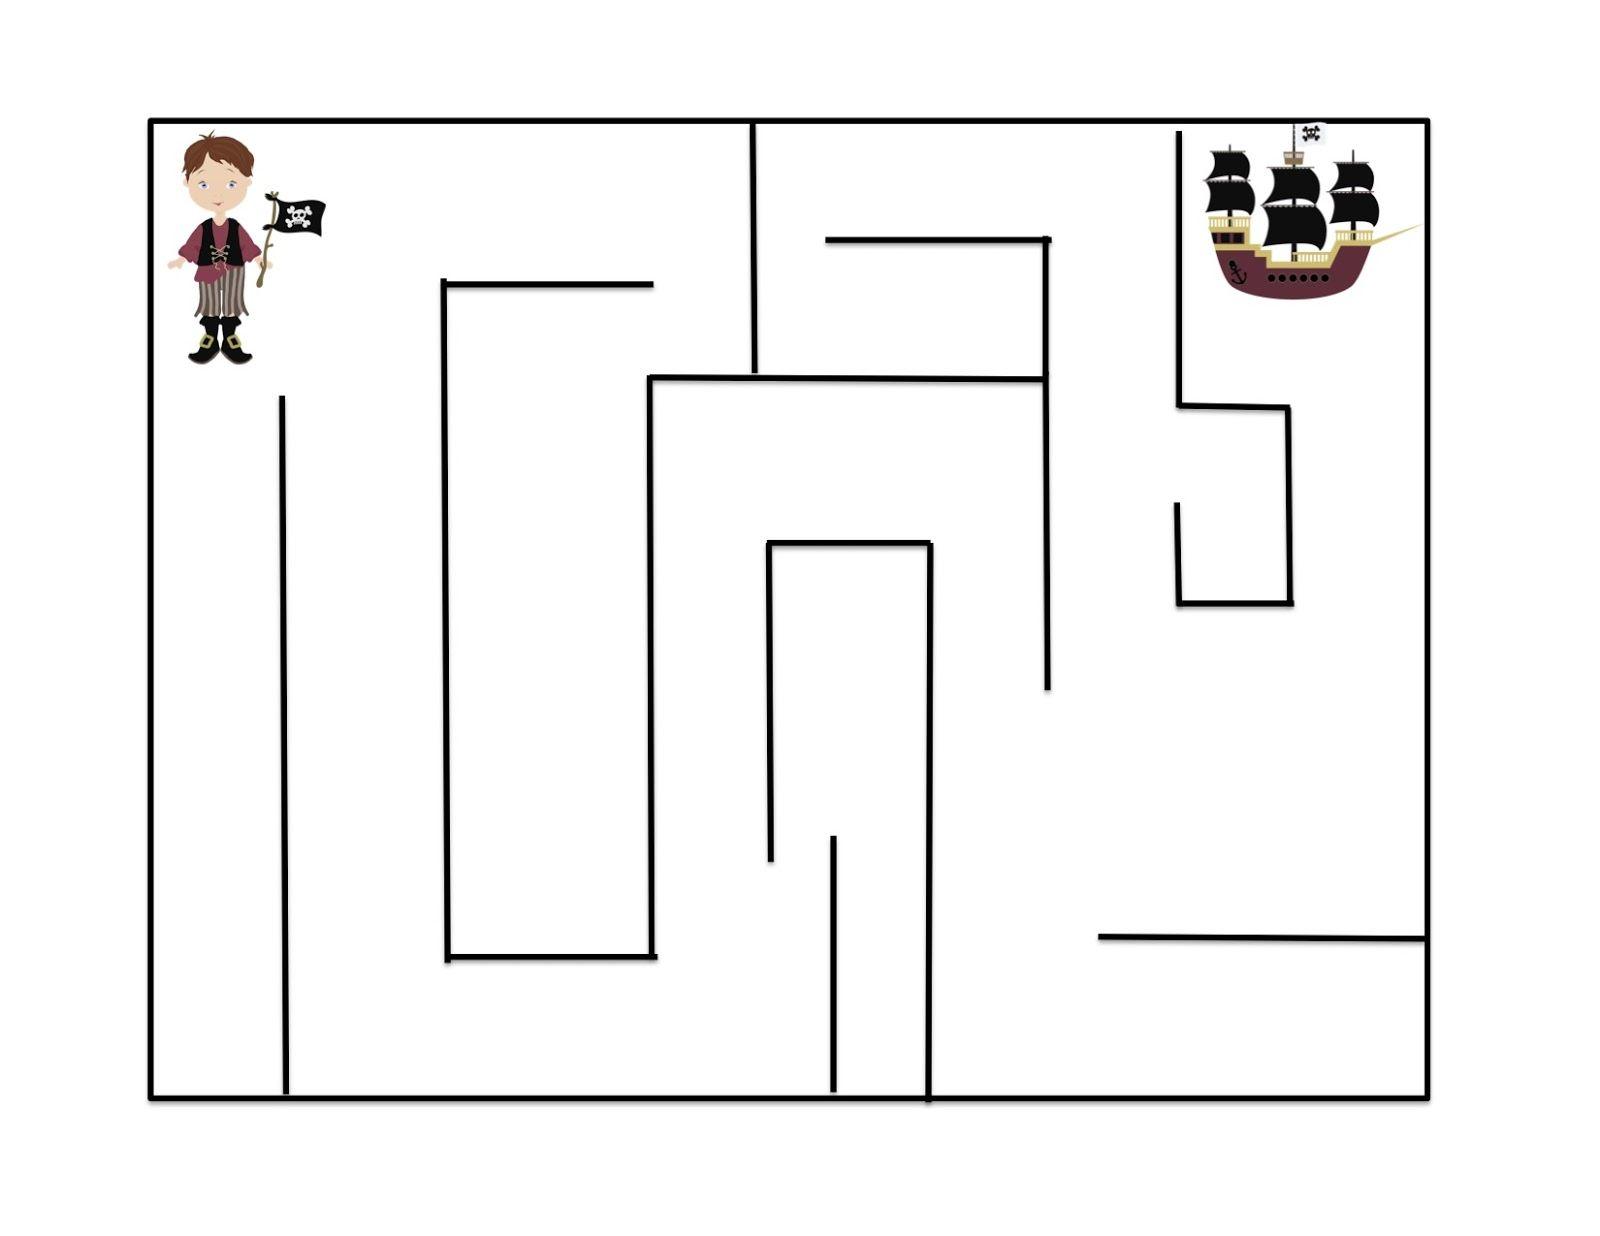 Pirates Pirate Activities Preschool Pirate Theme [ 1236 x 1600 Pixel ]